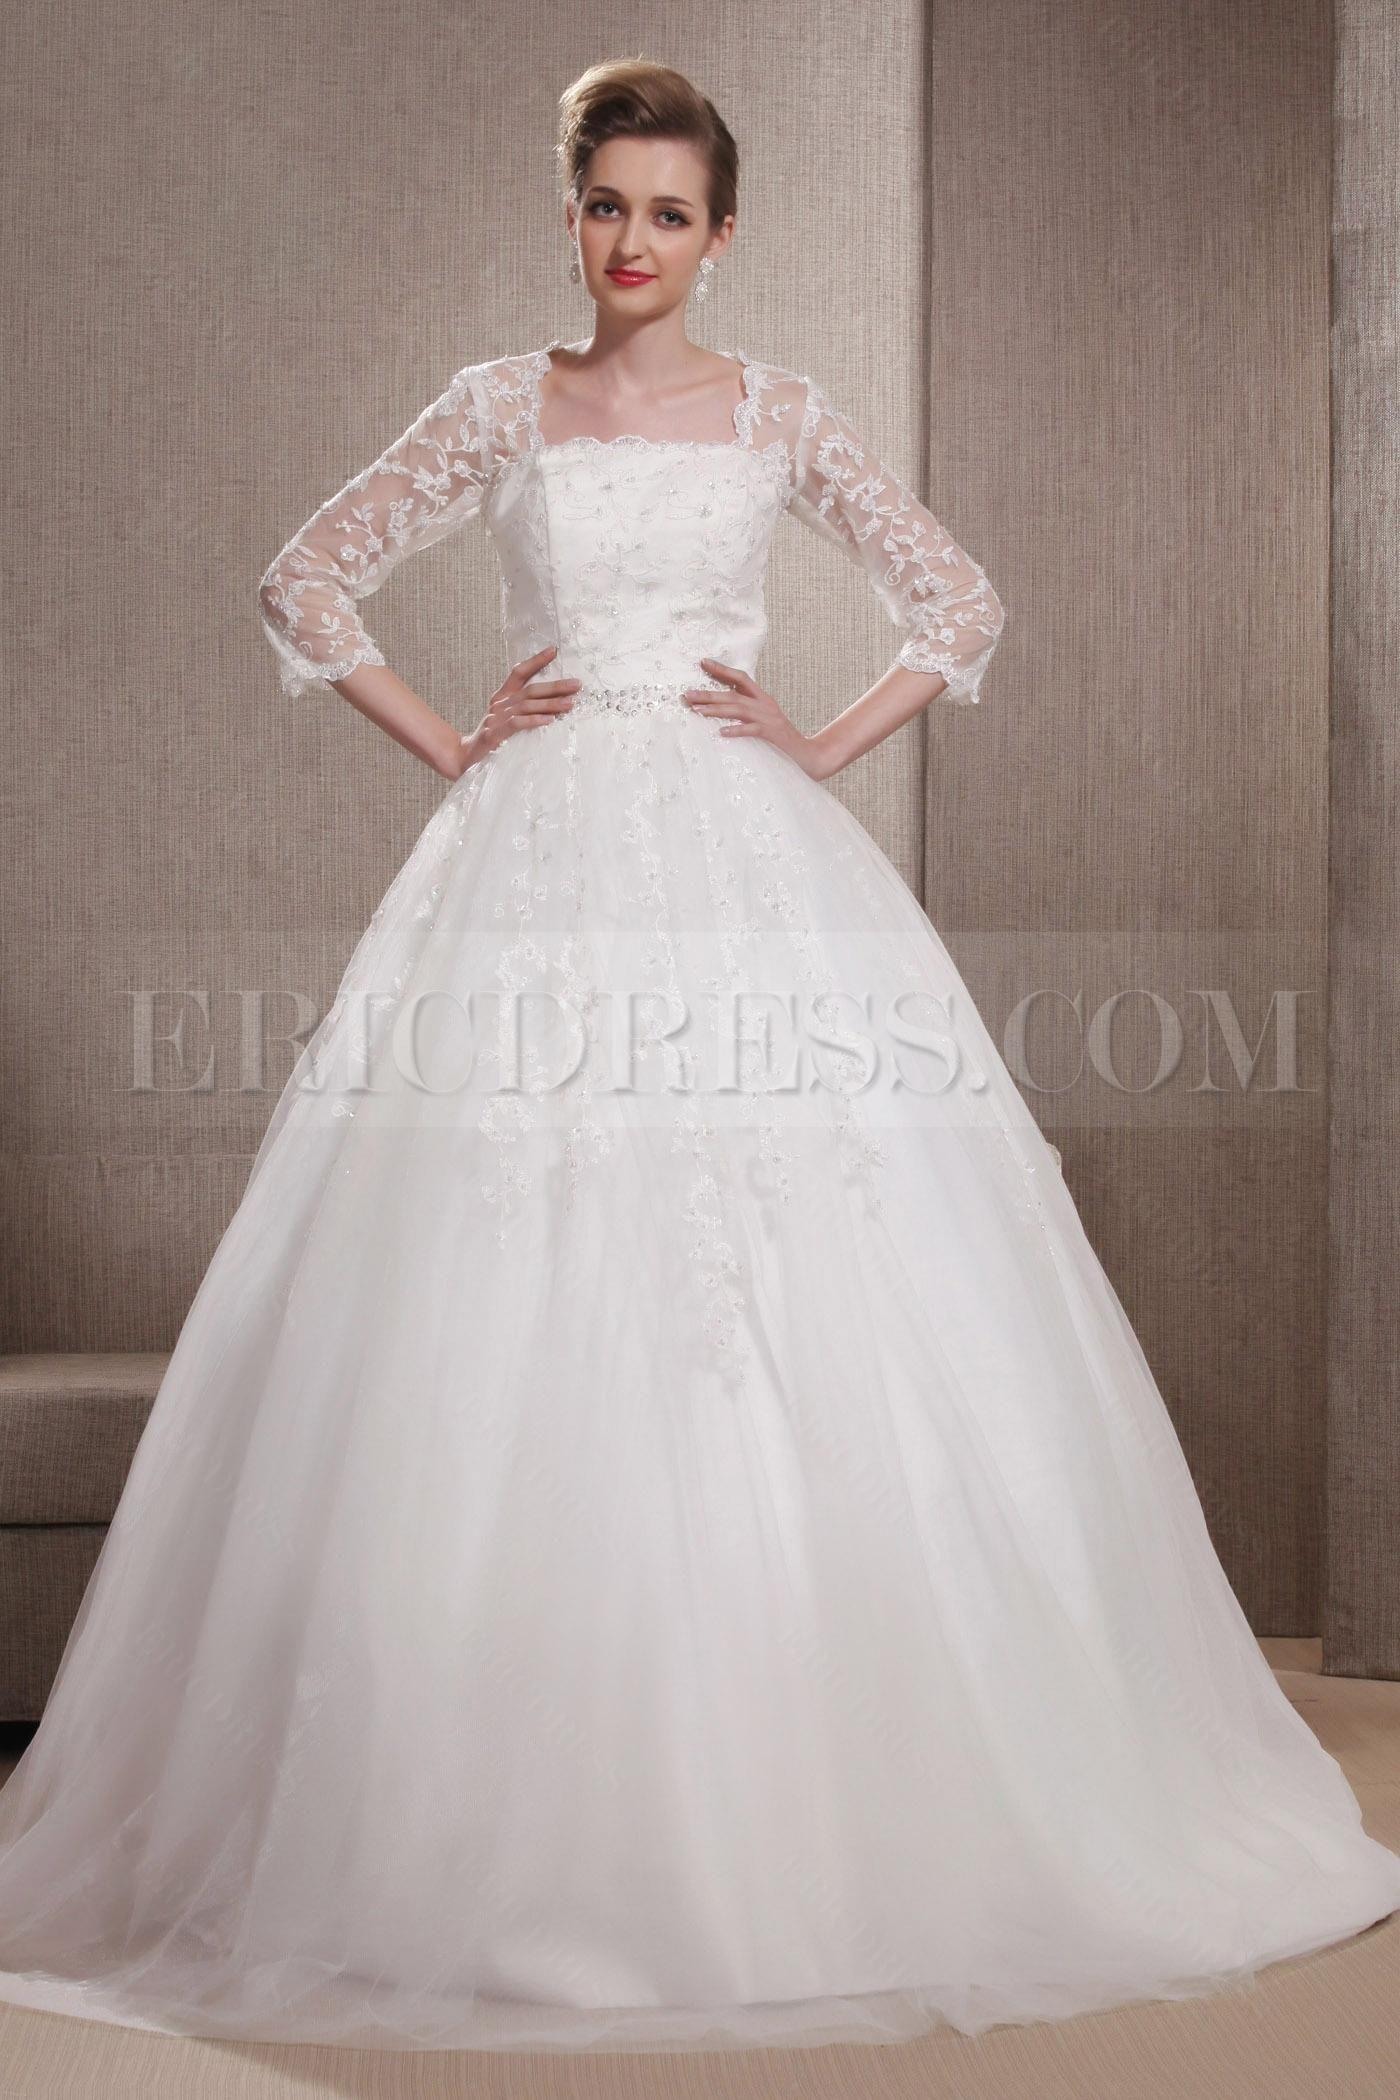 3/4 length lace wedding dress  Elaborate Aline Square Length Sleeves   sleeve wedding